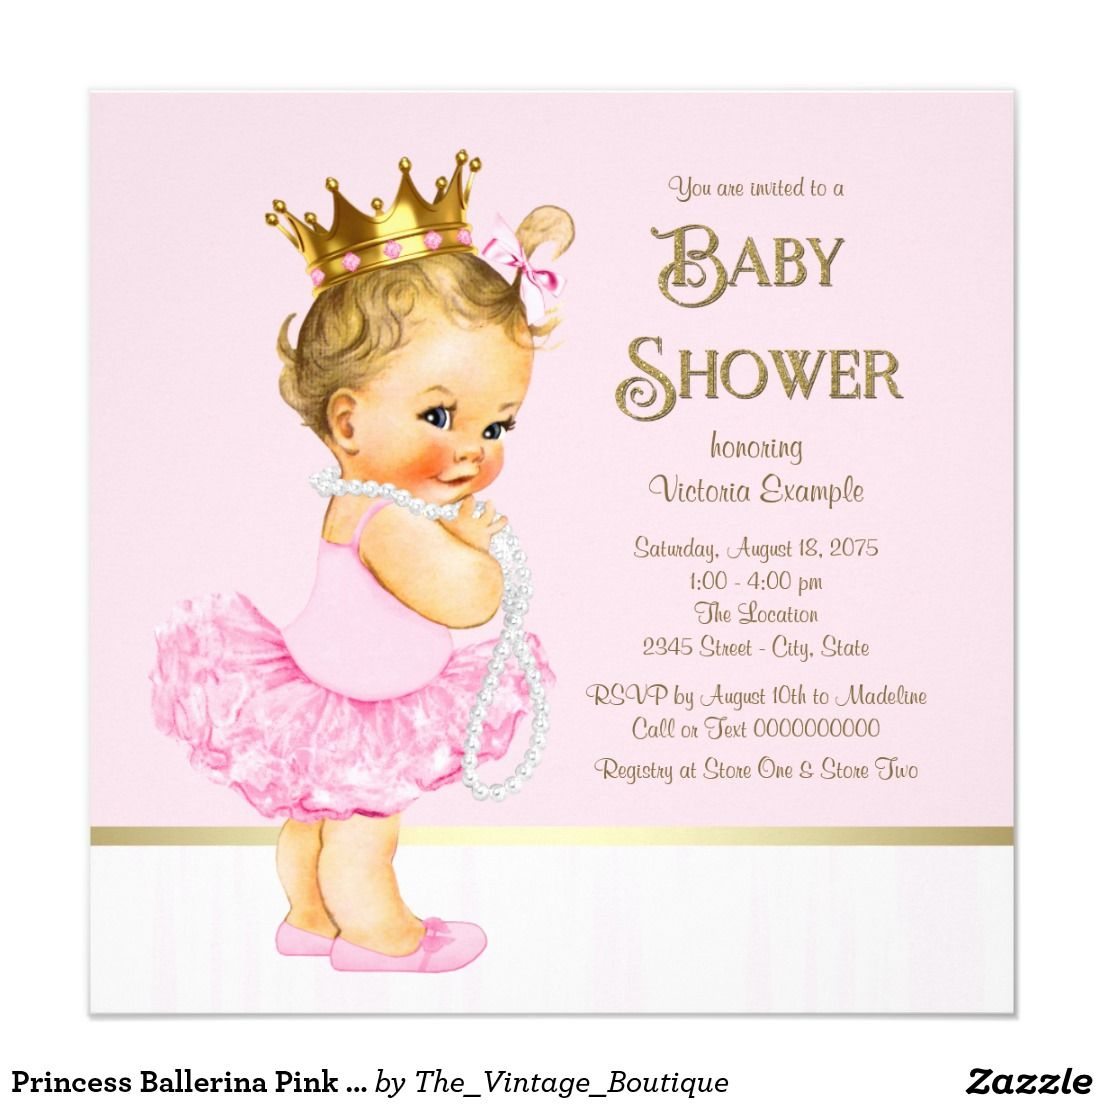 Princess Ballerina Pink Gold Baby Shower Card   Ballerina pink, Gold ...